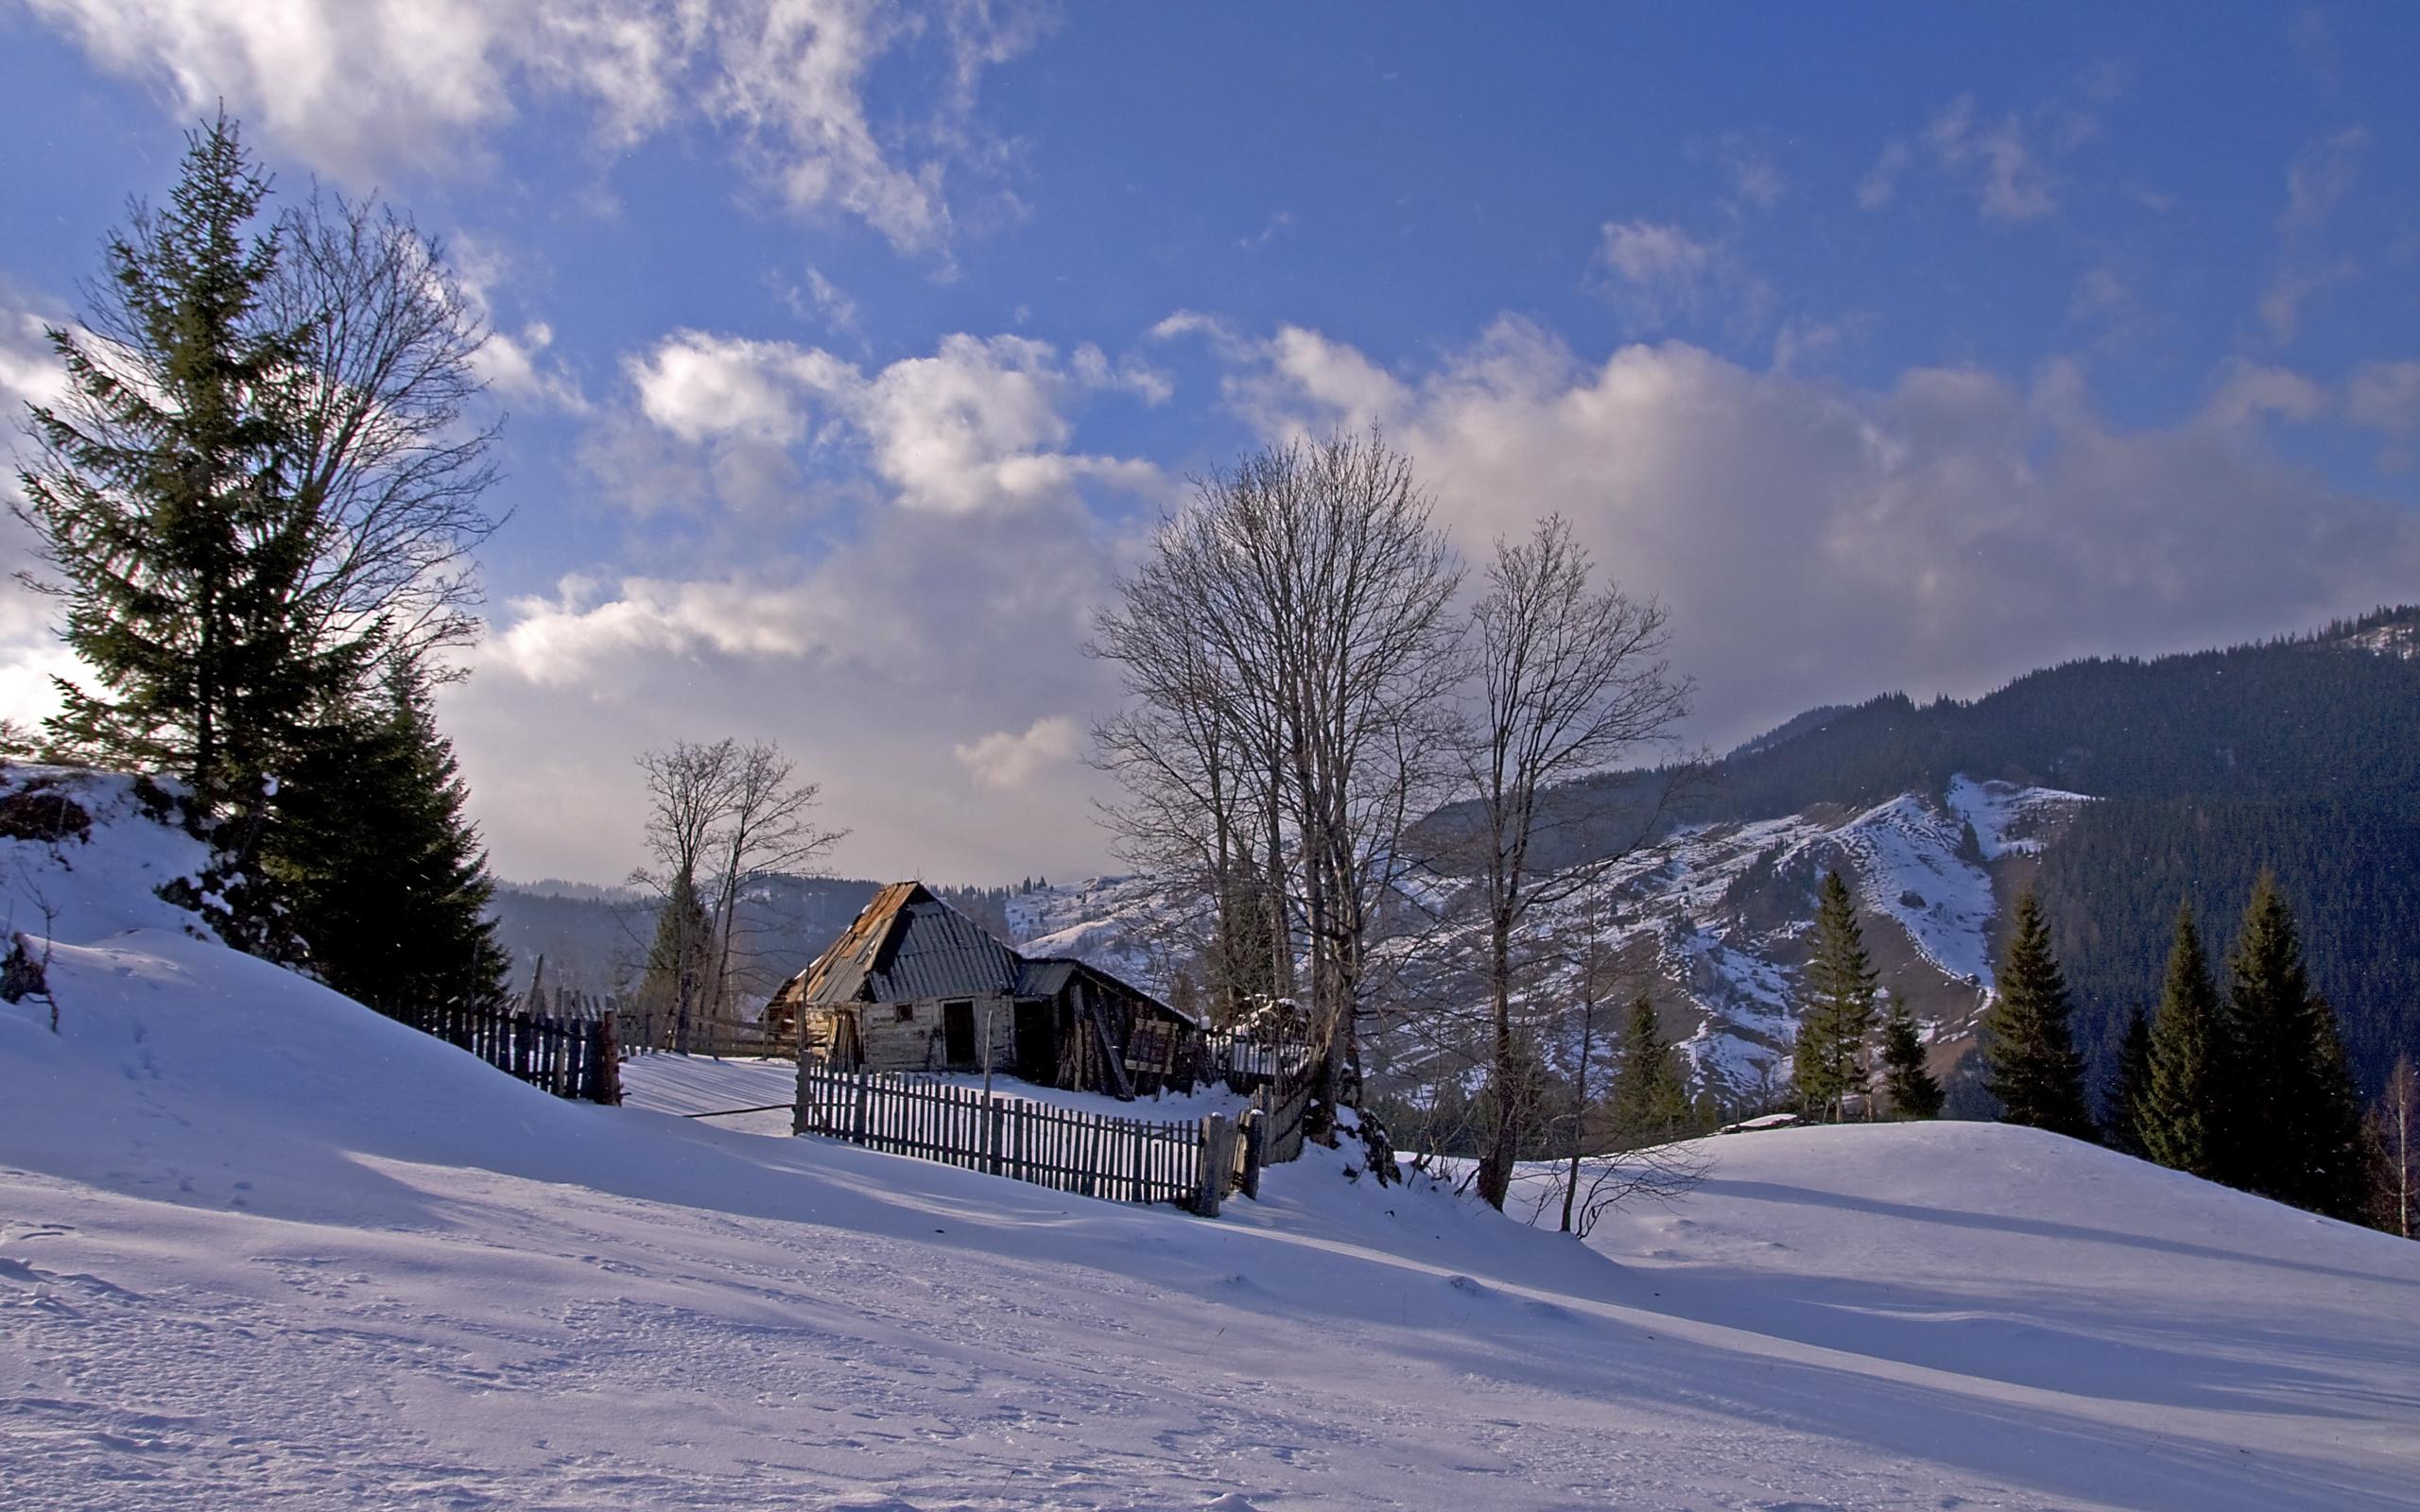 Romania Winter Snow House Trees Mountains Landscape